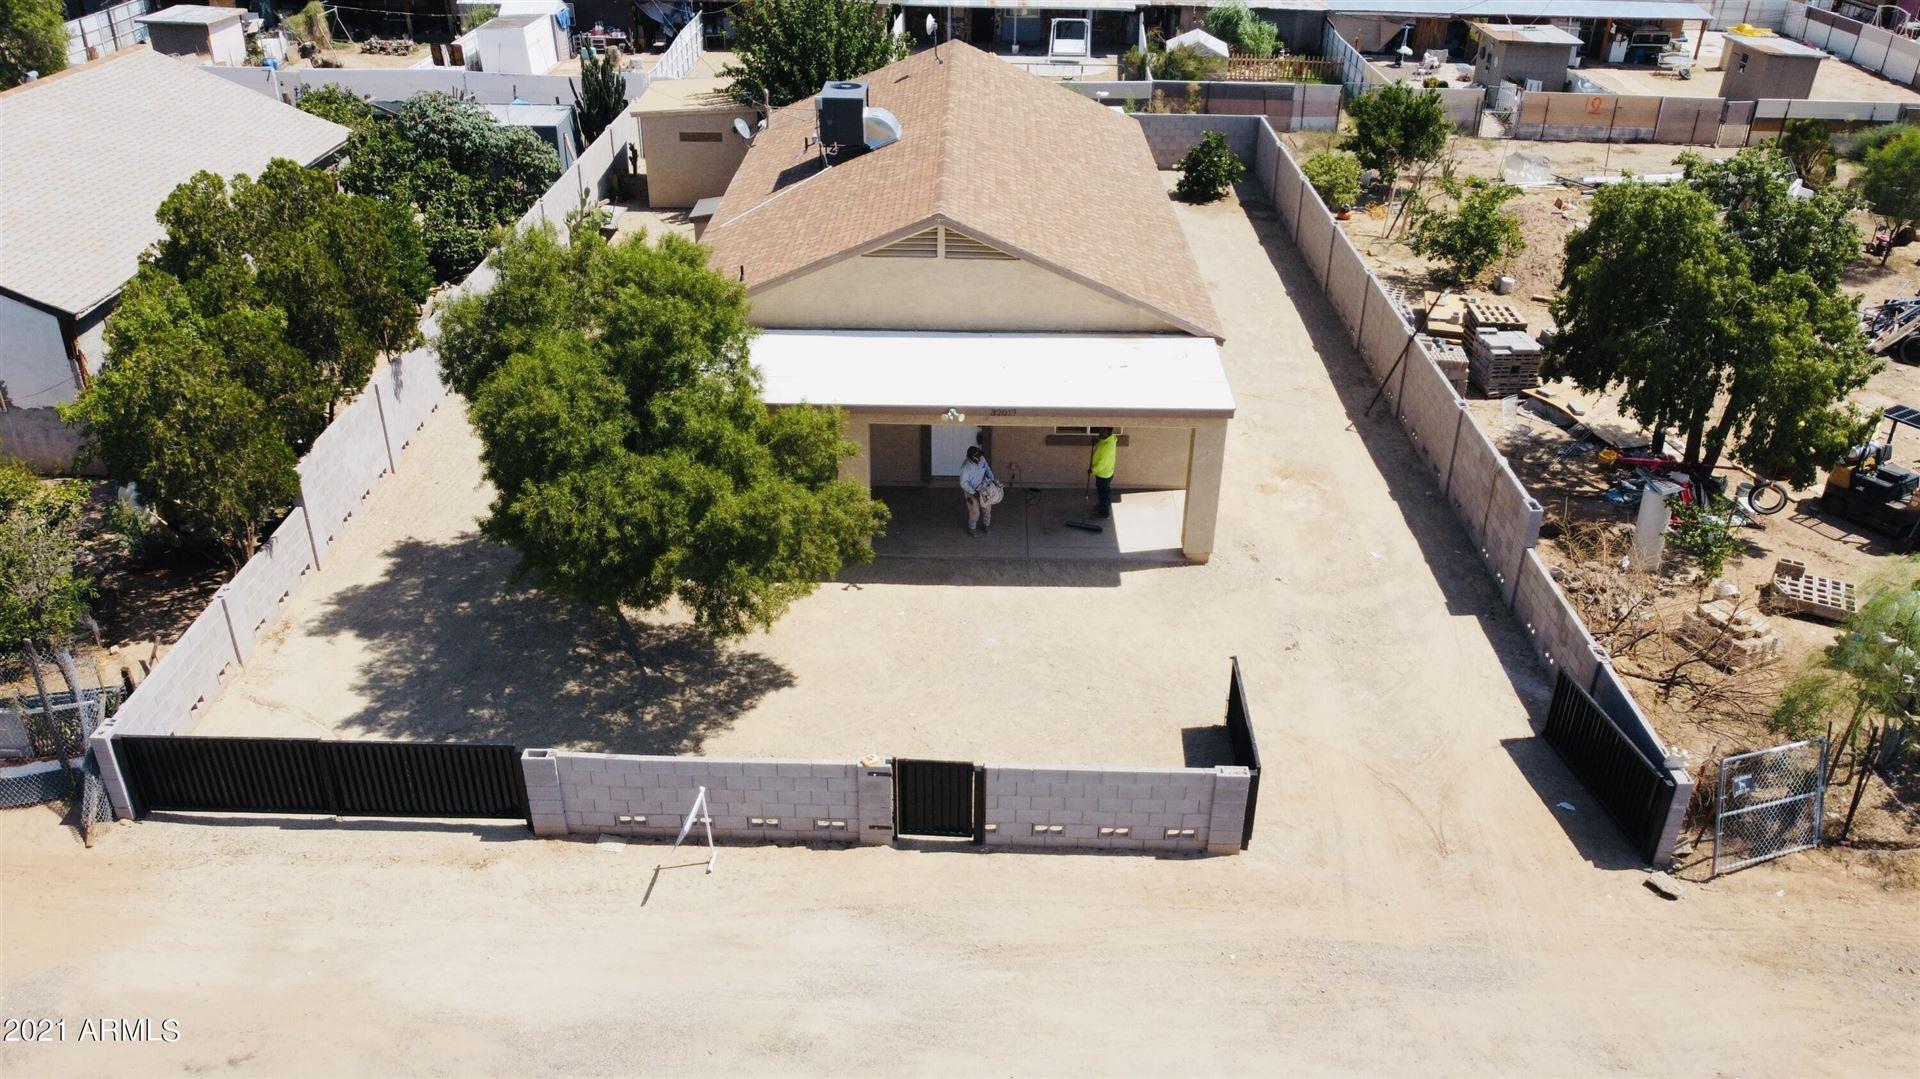 32017 W PALO VERDE Street, Wittmann, AZ 85361 - MLS#: 6270119